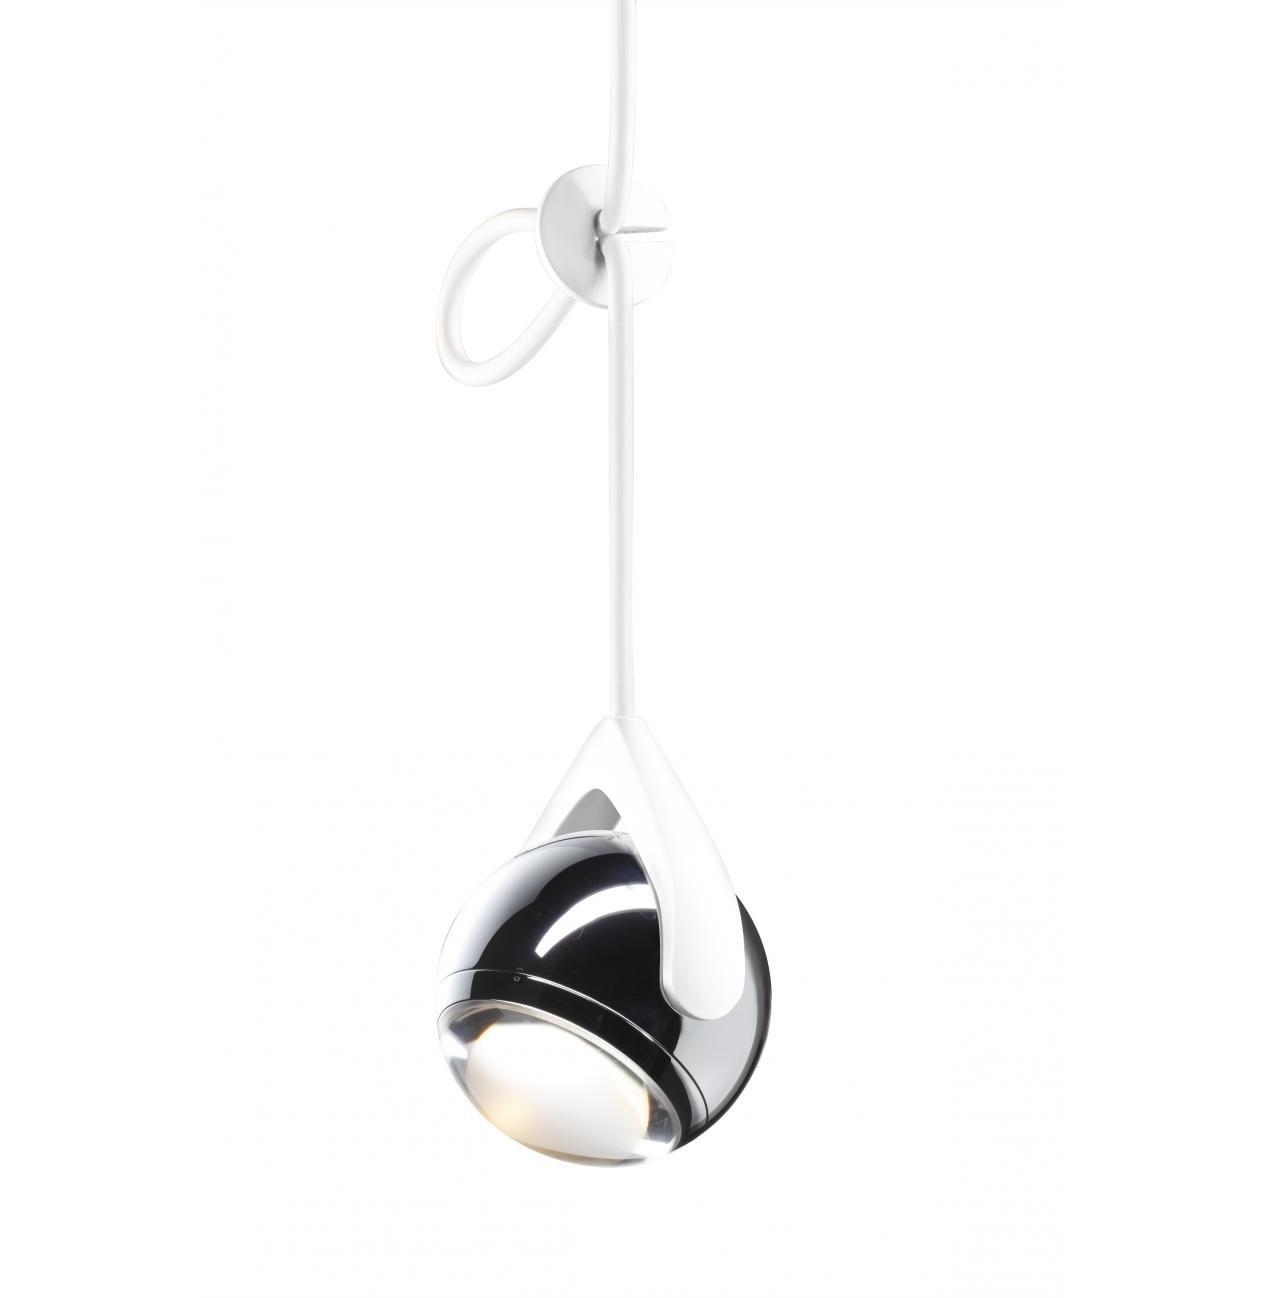 tobias grau hanglamp falling star versteeg lichtstudio. Black Bedroom Furniture Sets. Home Design Ideas